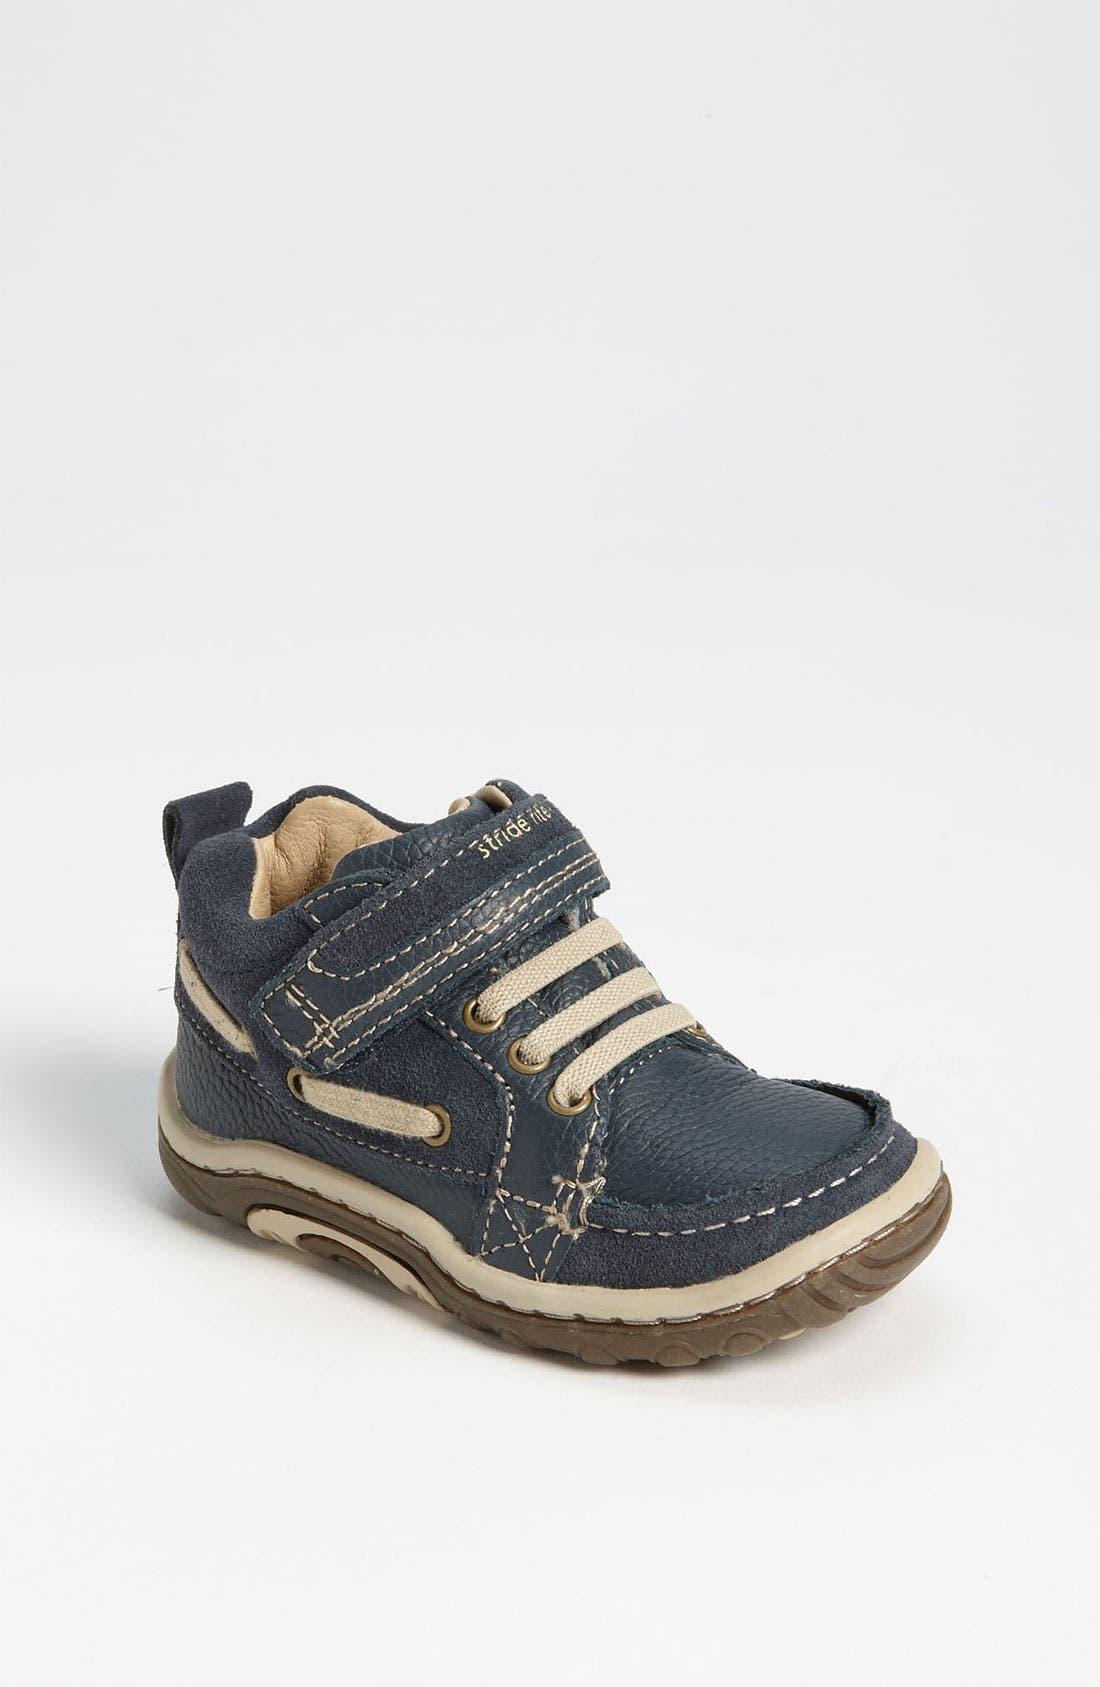 Main Image - Stride Rite 'Toby' Sneaker (Baby, Walker & Toddler)